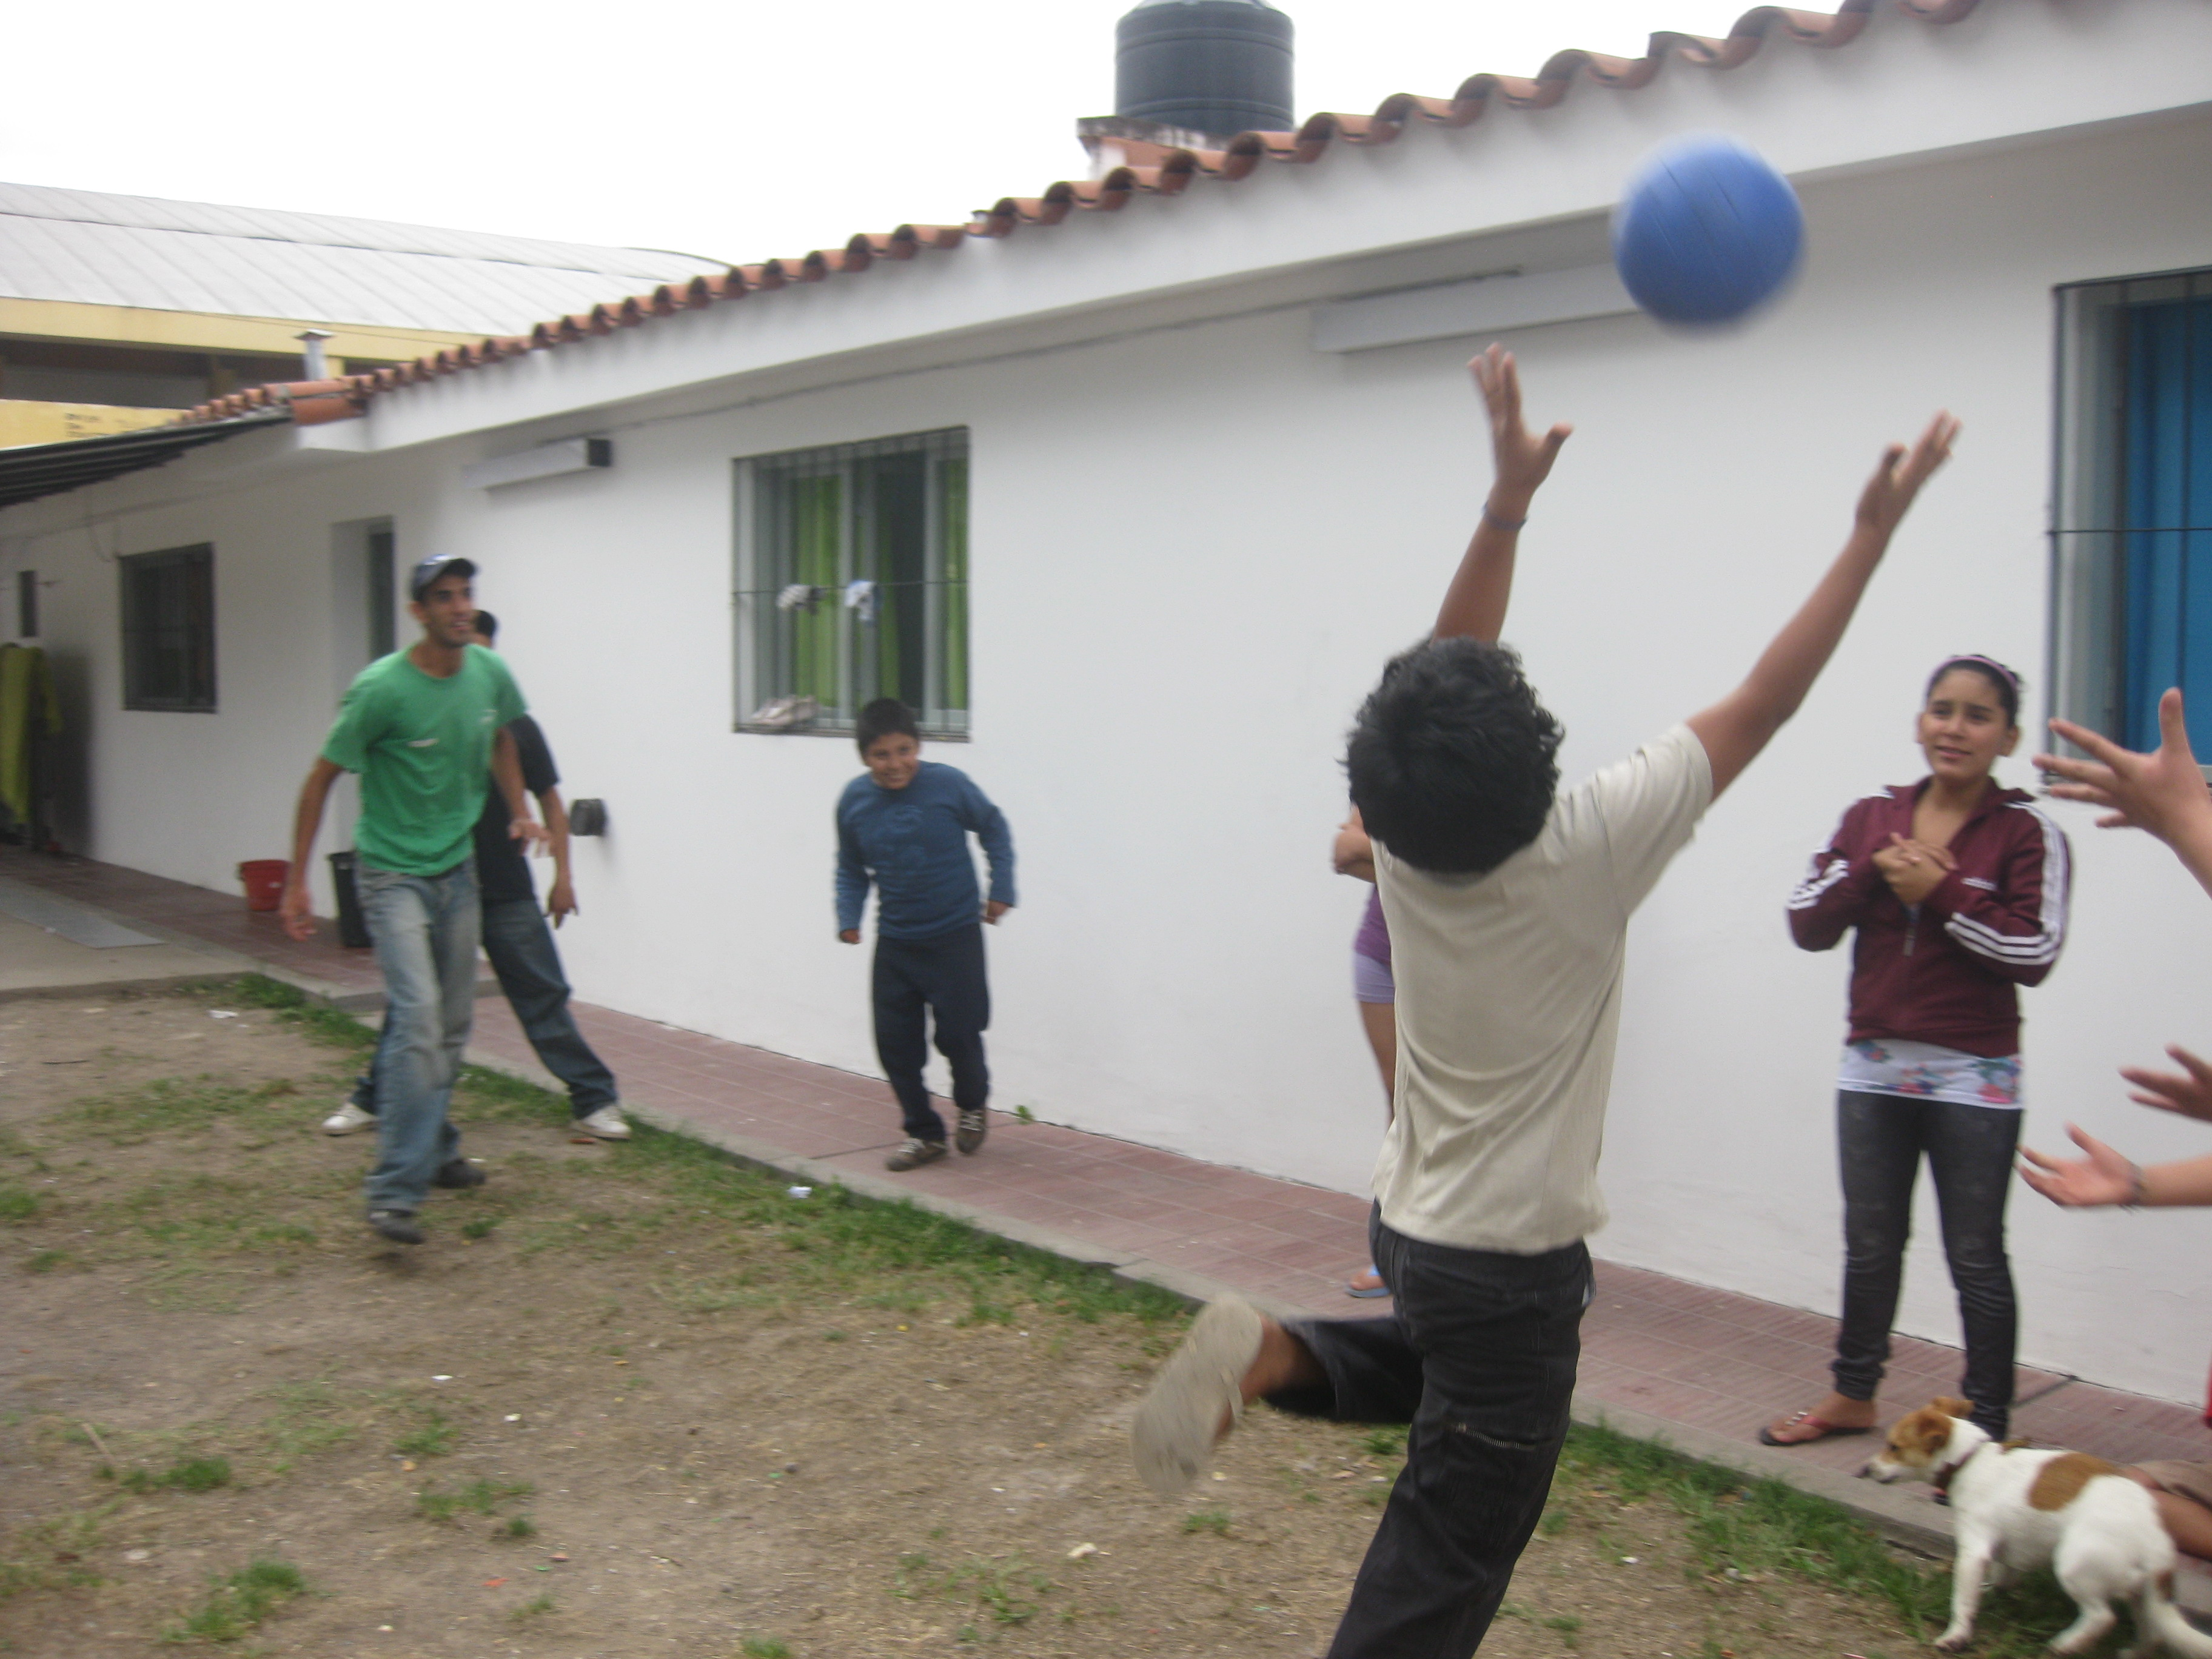 Actividades en Orfanato en Salta